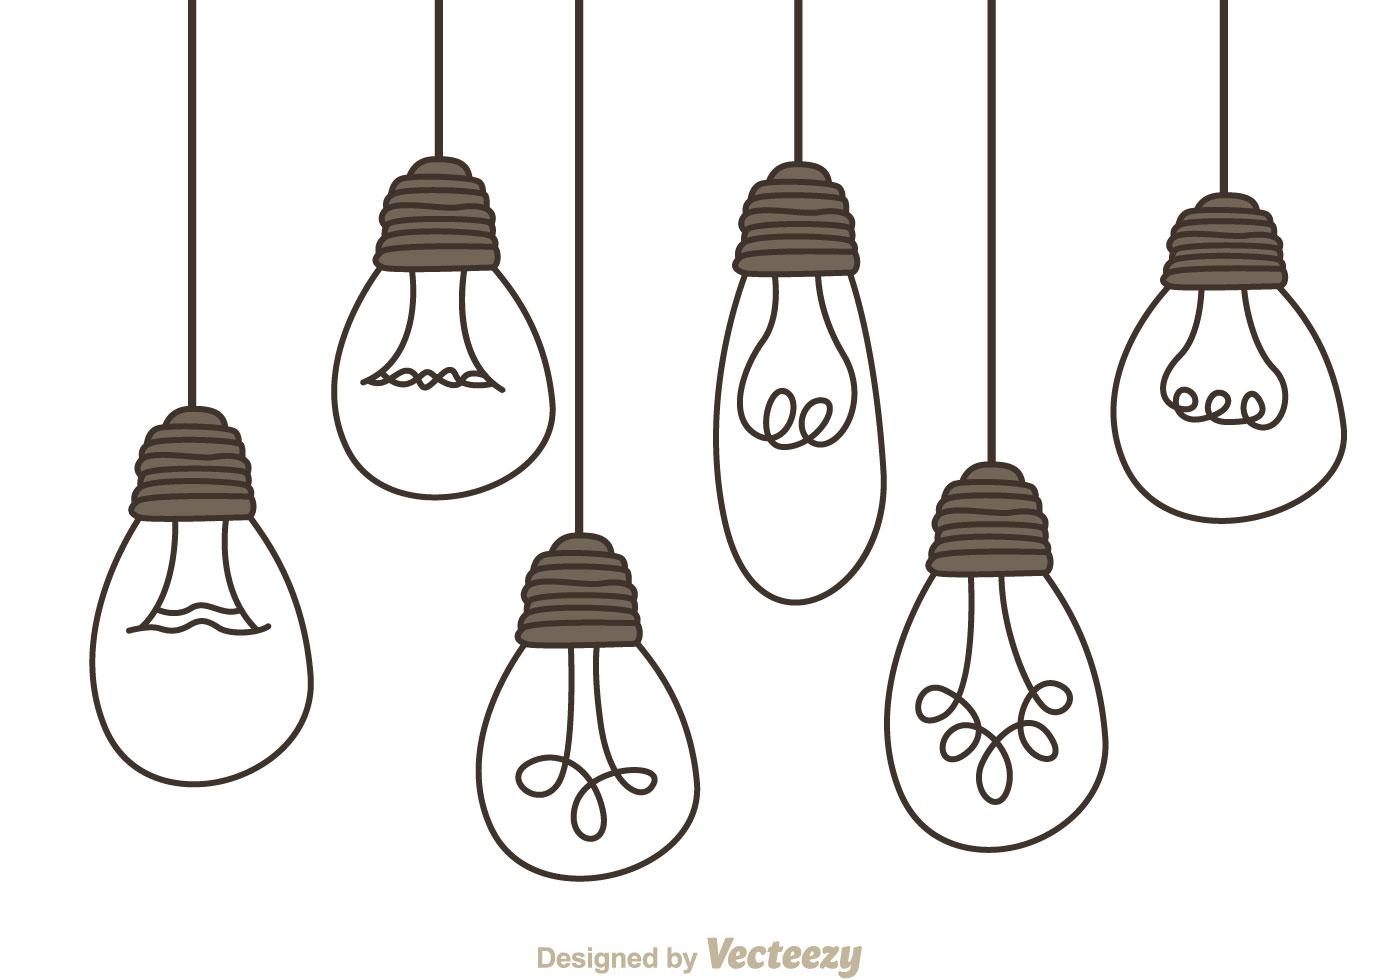 hanging light bulbs download free vector art  stock light bulb vector free icon light bulb vector free